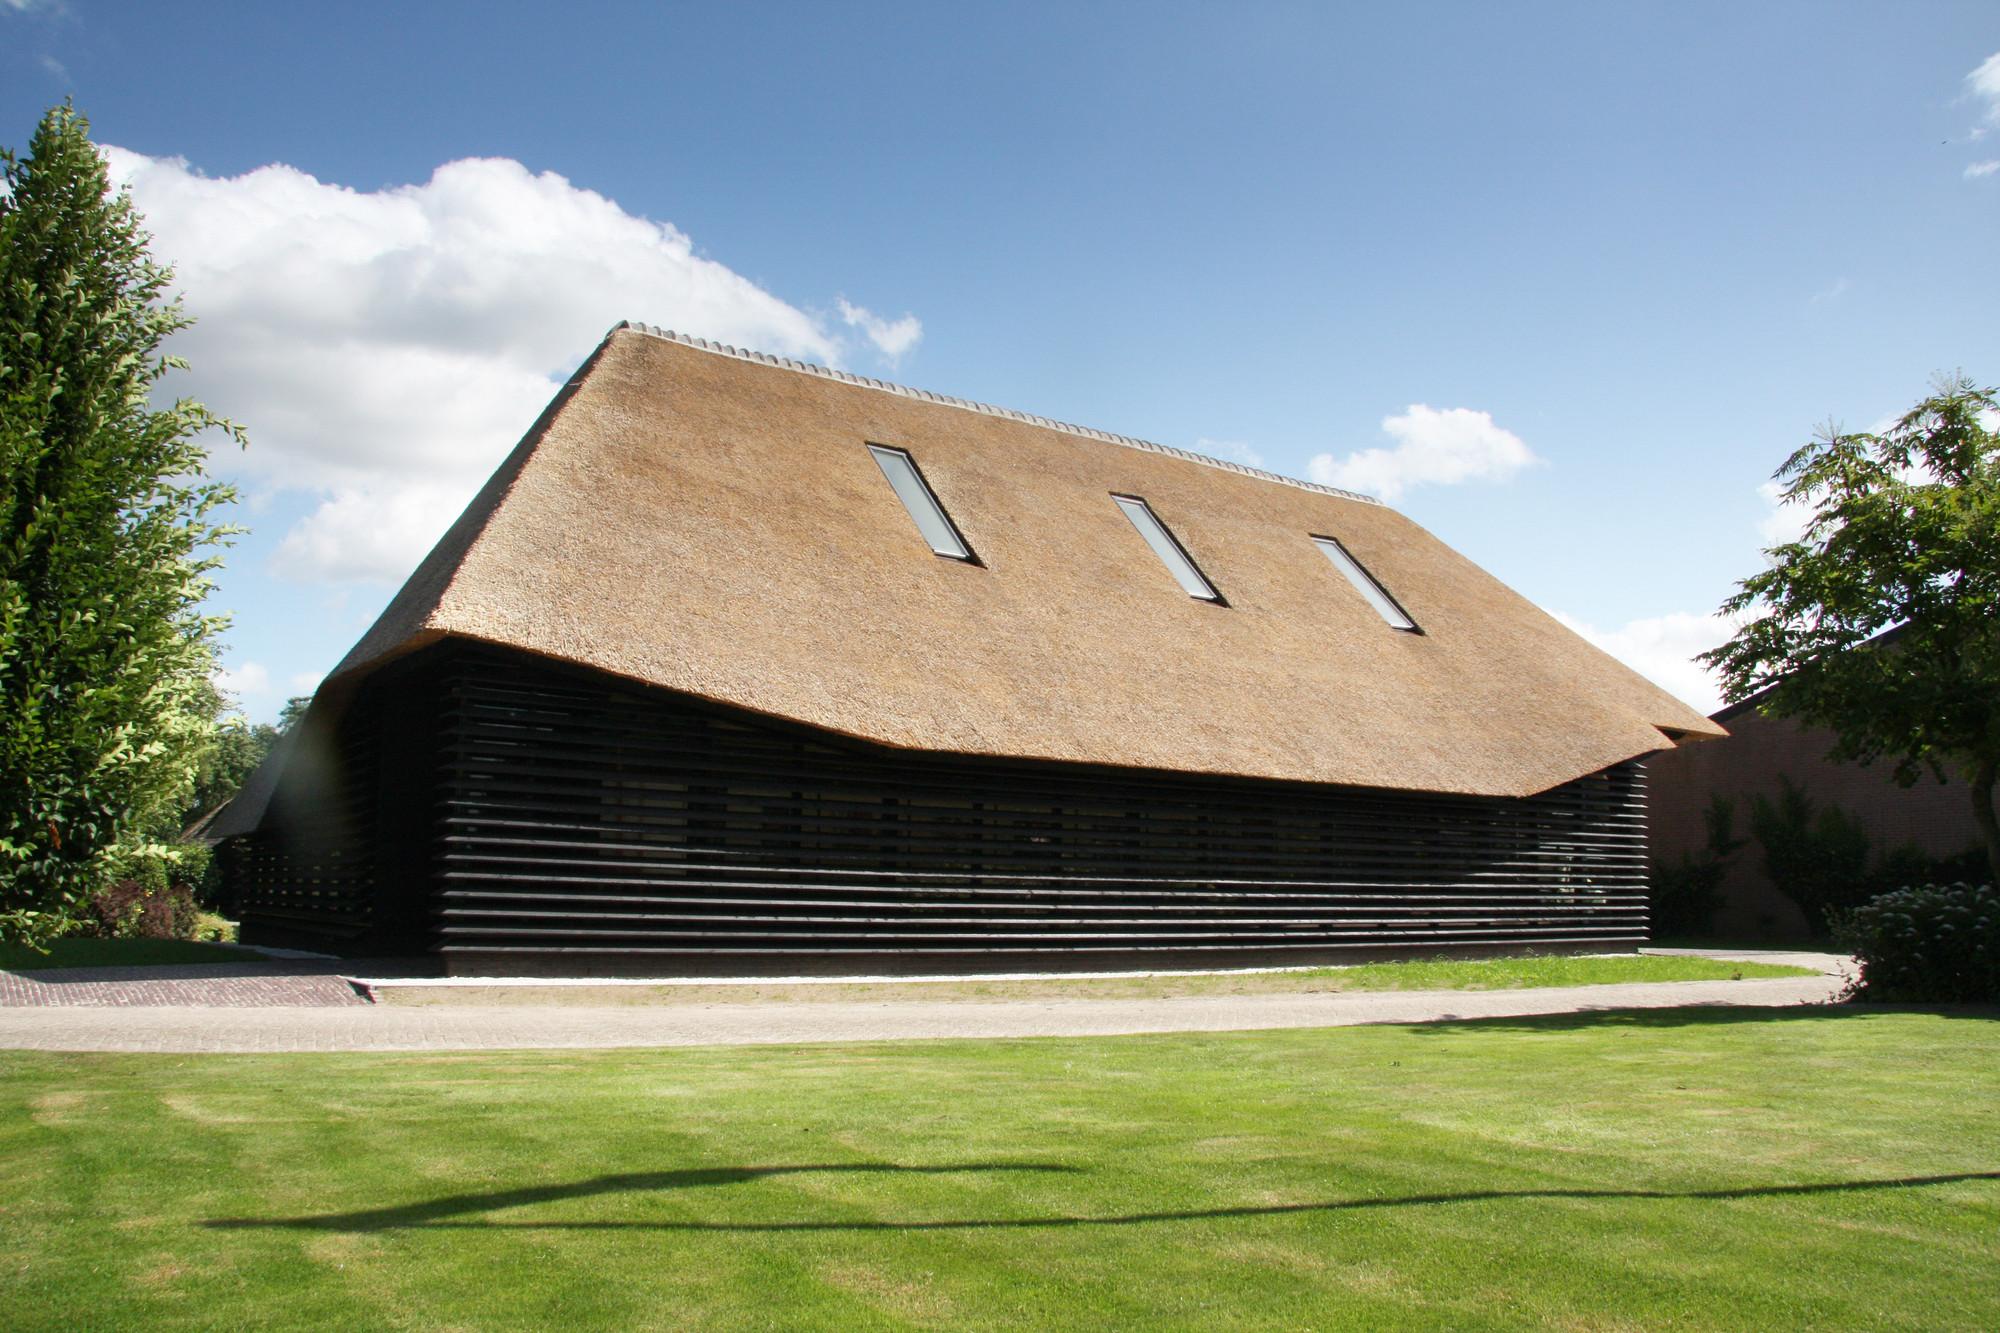 Flemish Barn Bolberg / arend groenewegen architect, Courtesy of arend groenewegen architect